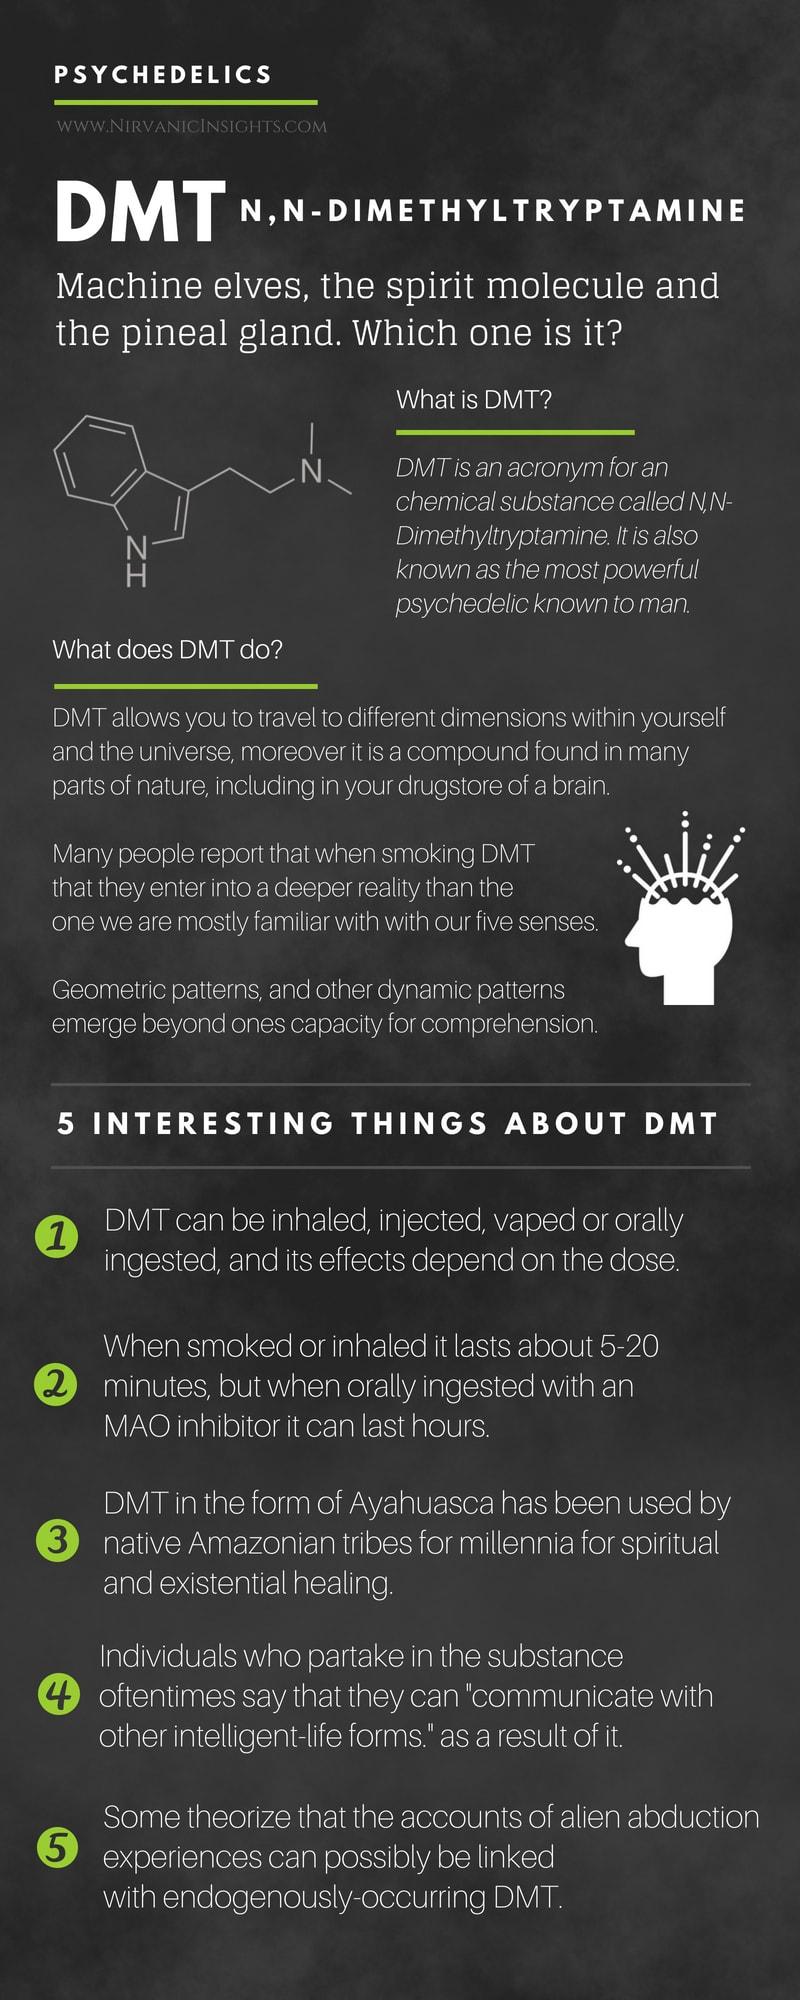 N,N-Dimethyltryptamine (DMT)